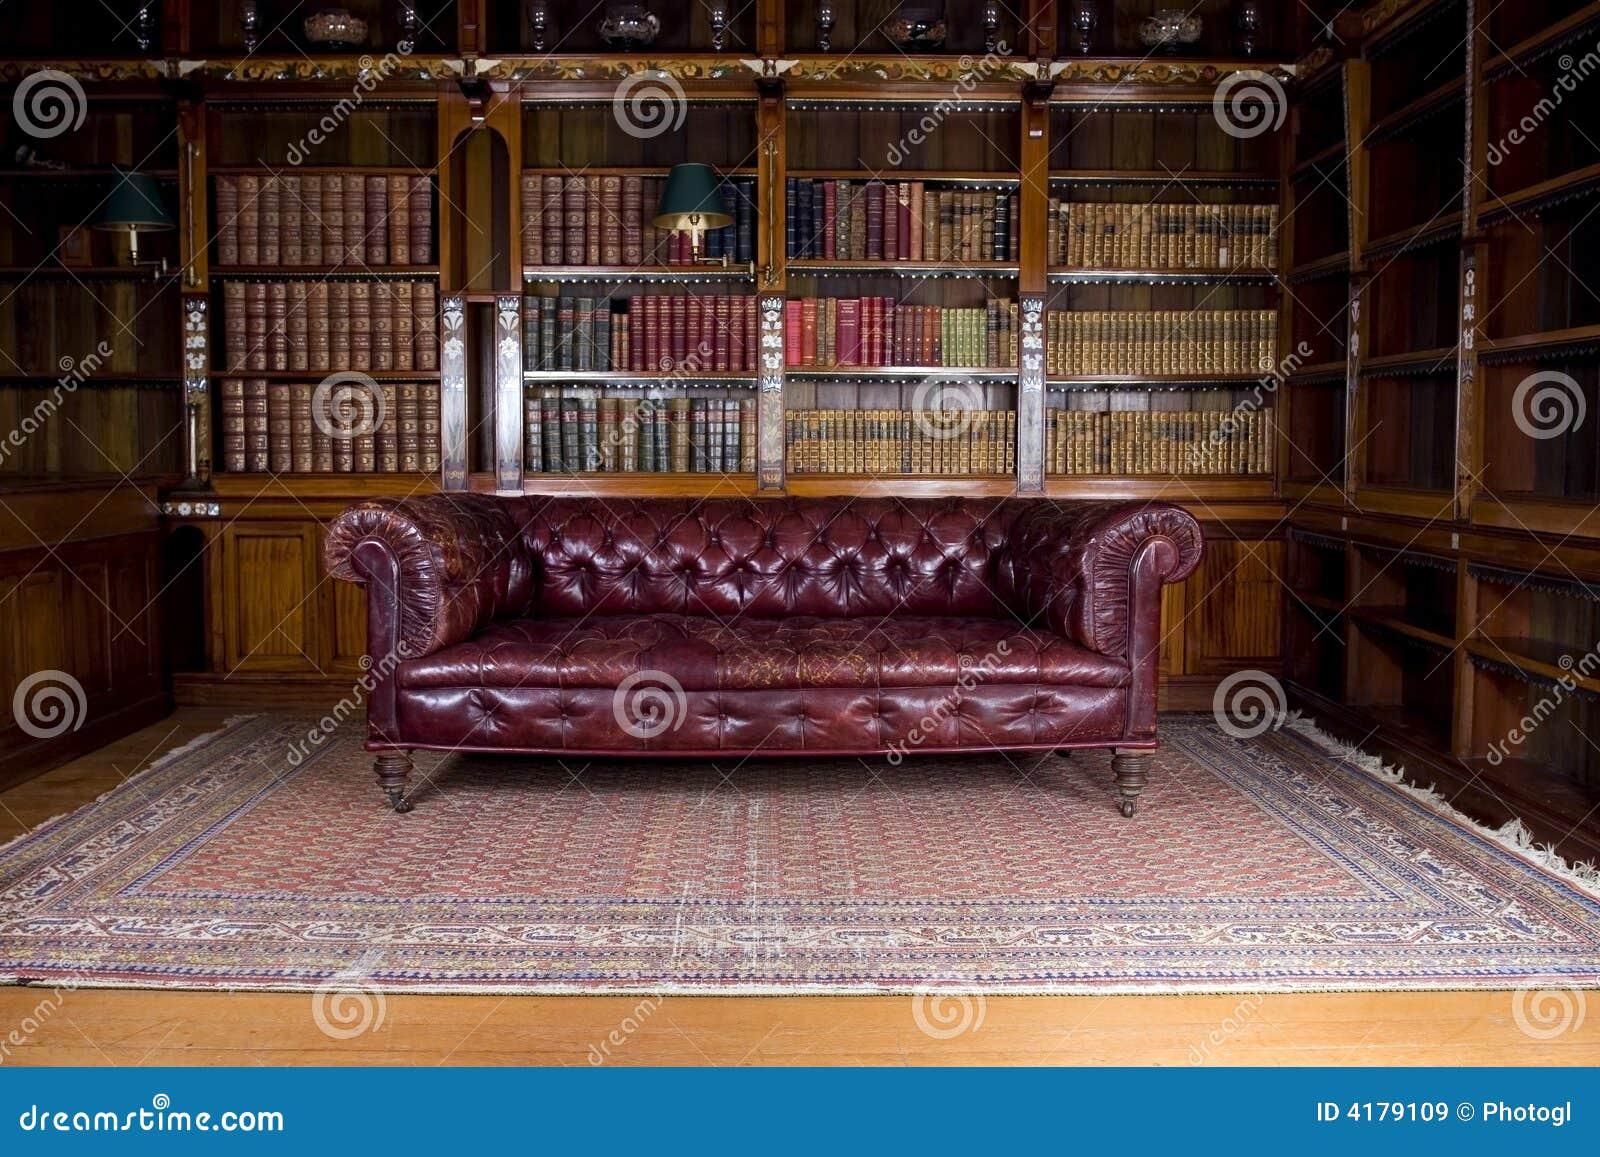 Retro leather couch stock image. Image of dark, retro - 4179109